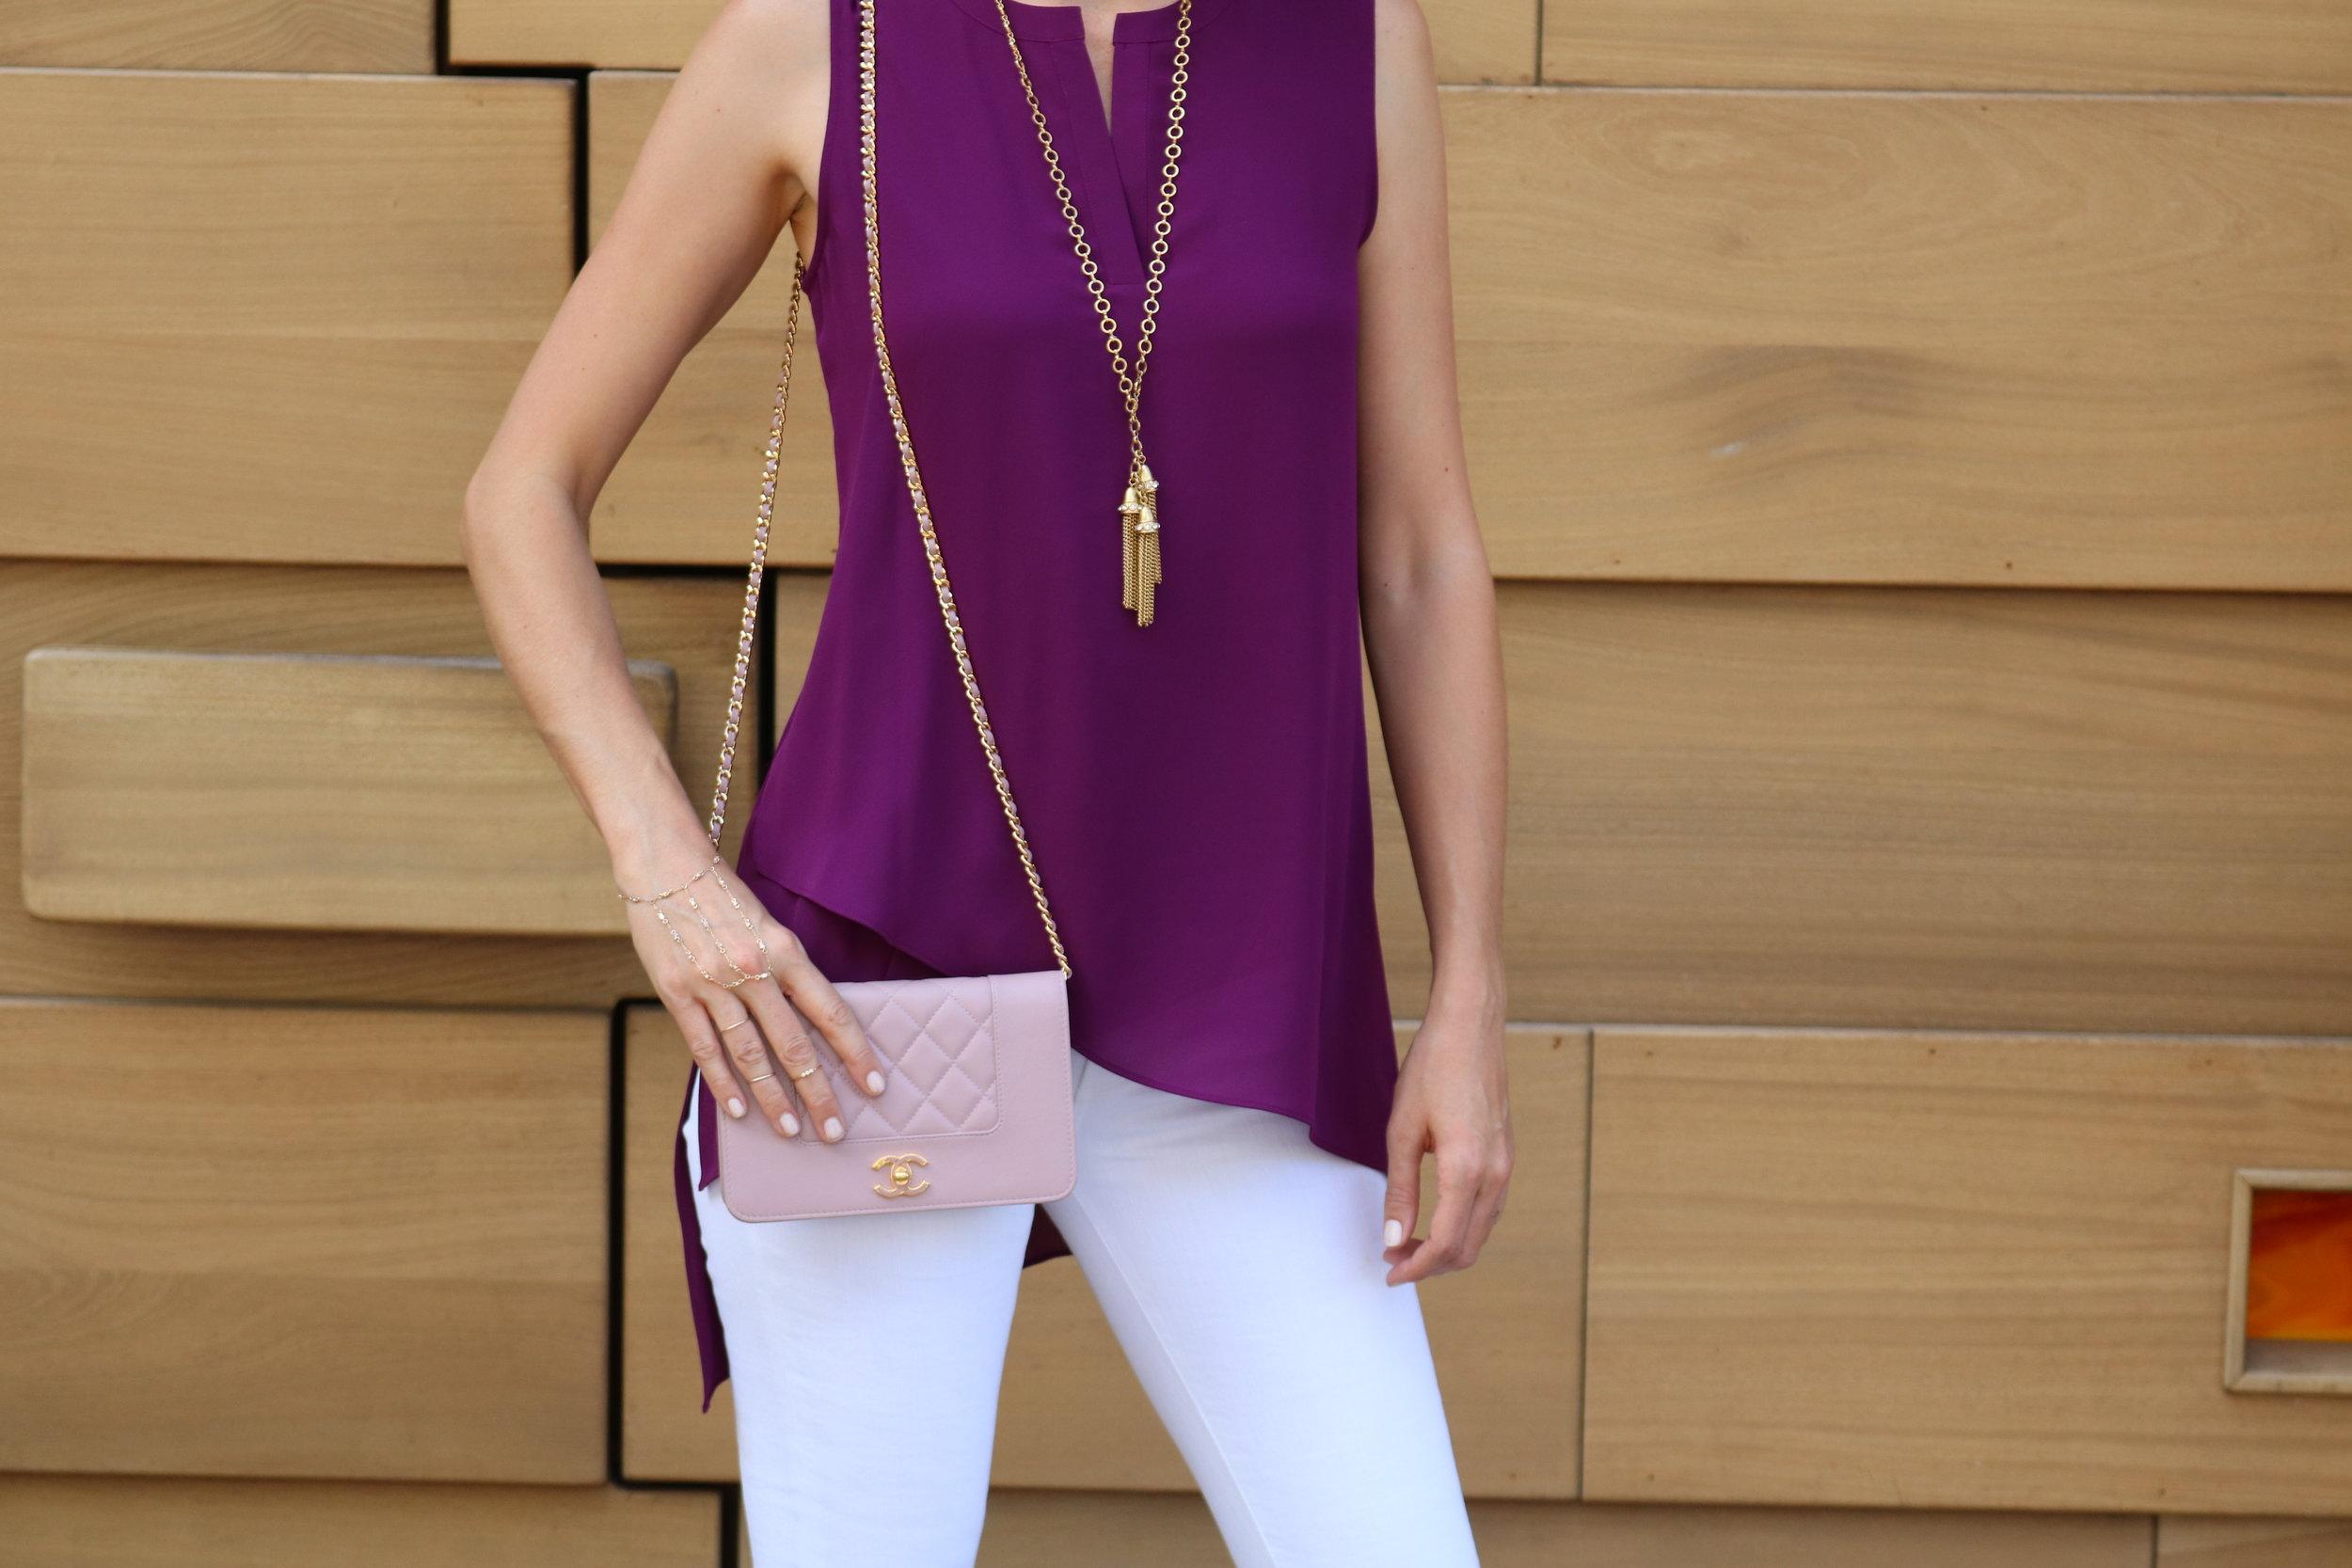 PLEIONE-Sleeveless-Asymmetrical-Tunic-AG-white-jeans-chanel-bag-chain